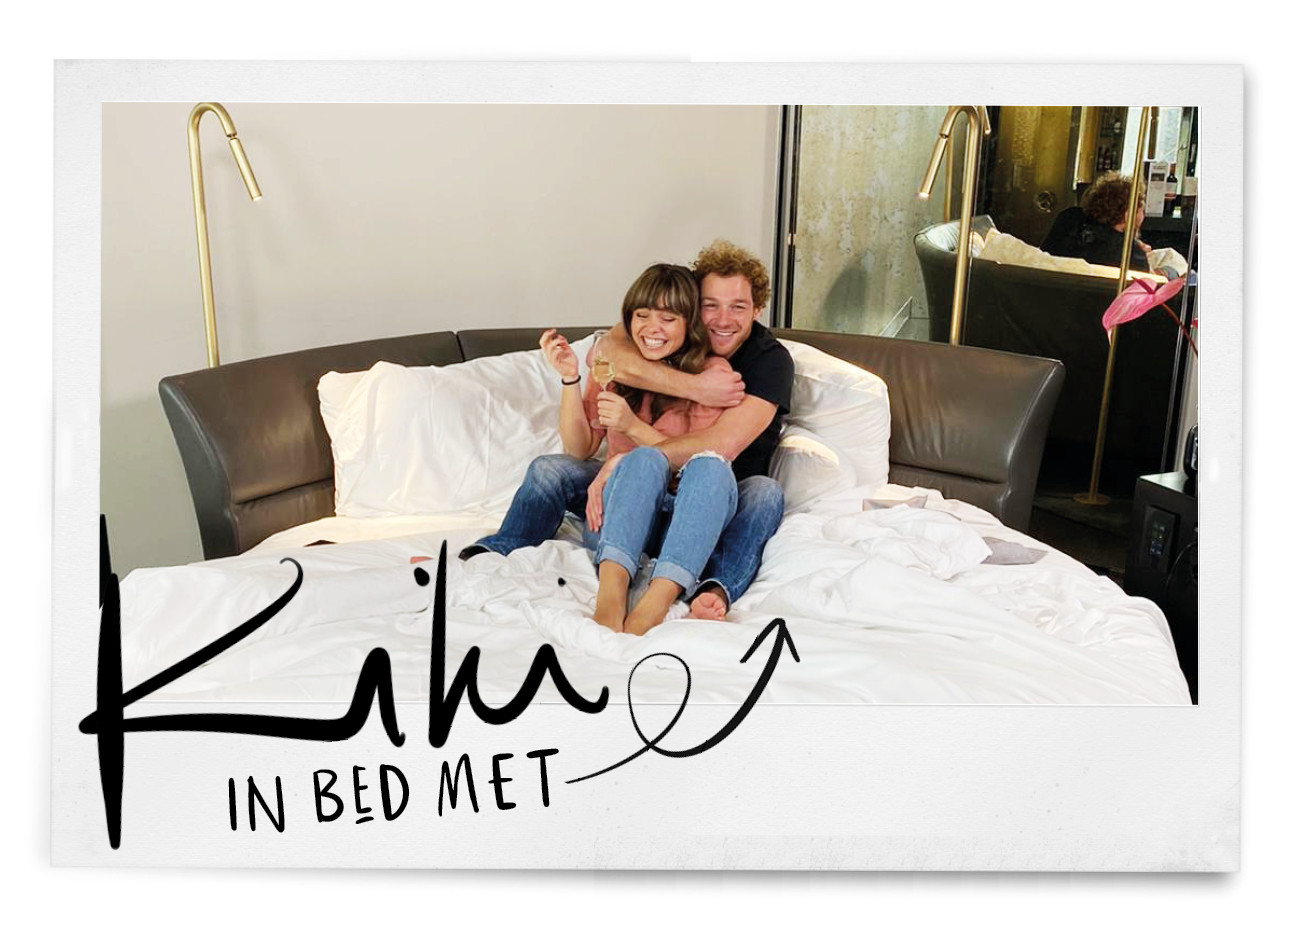 Kiki en Jamie in bed in het hotel w